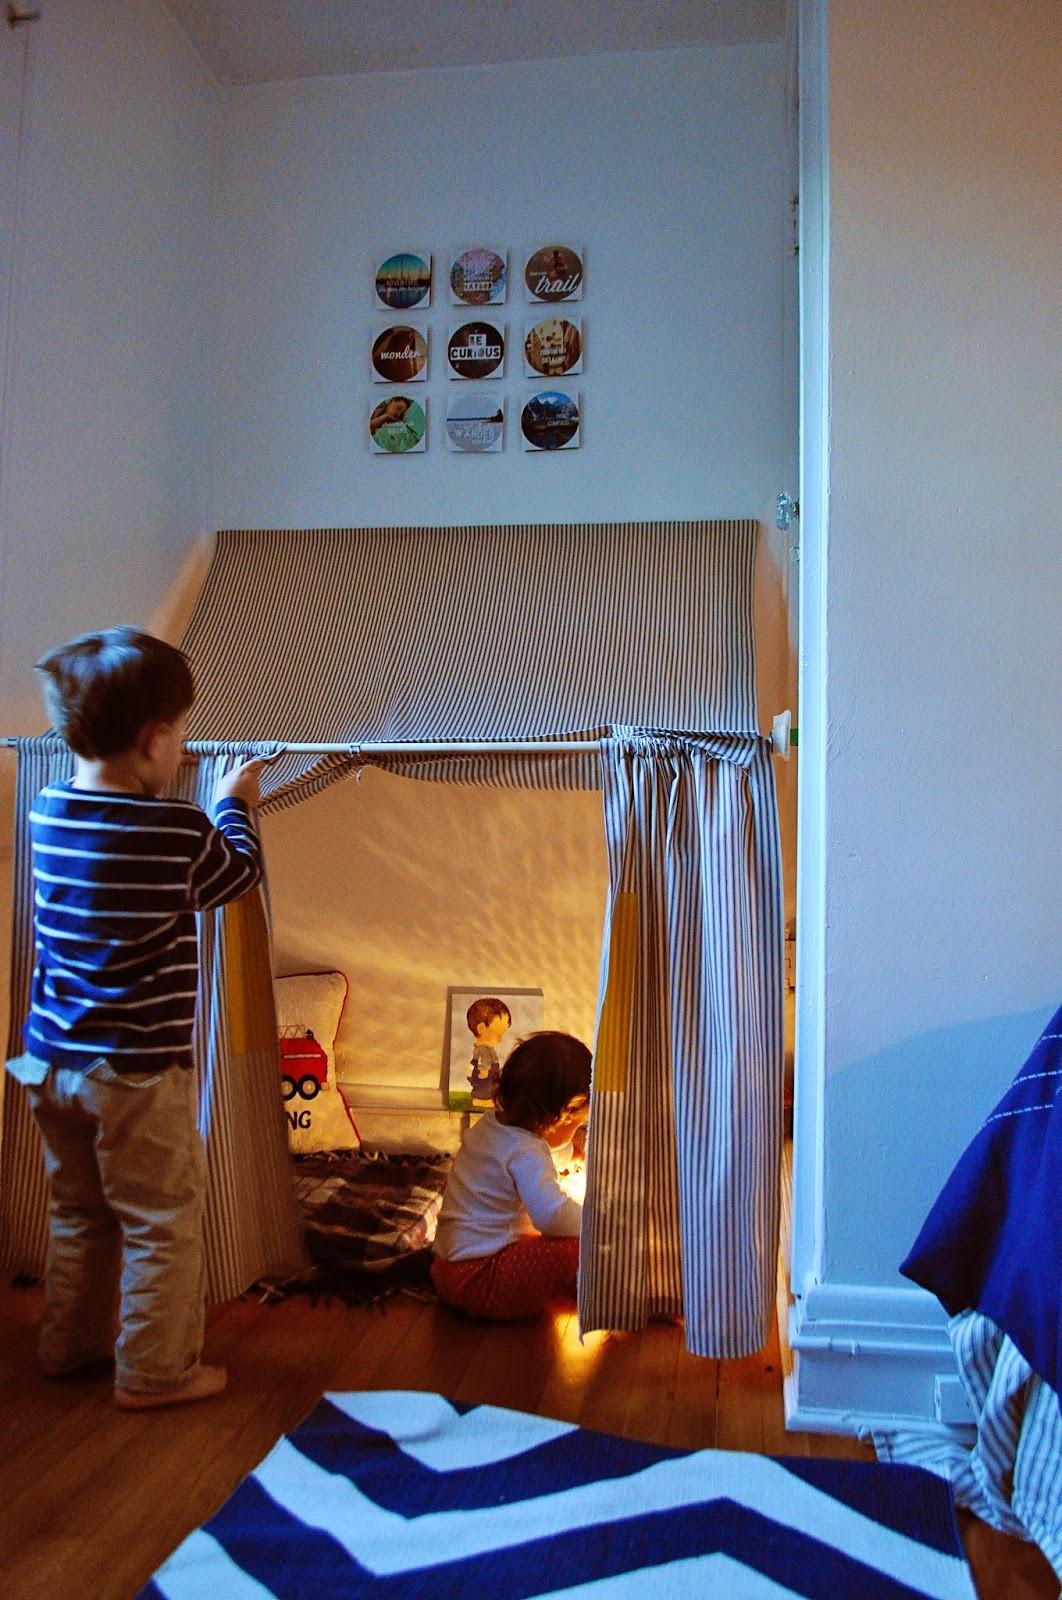 Tent For Kids Room  Ducklings In A Row Hair DIY Tutorials Indoor Tent How To